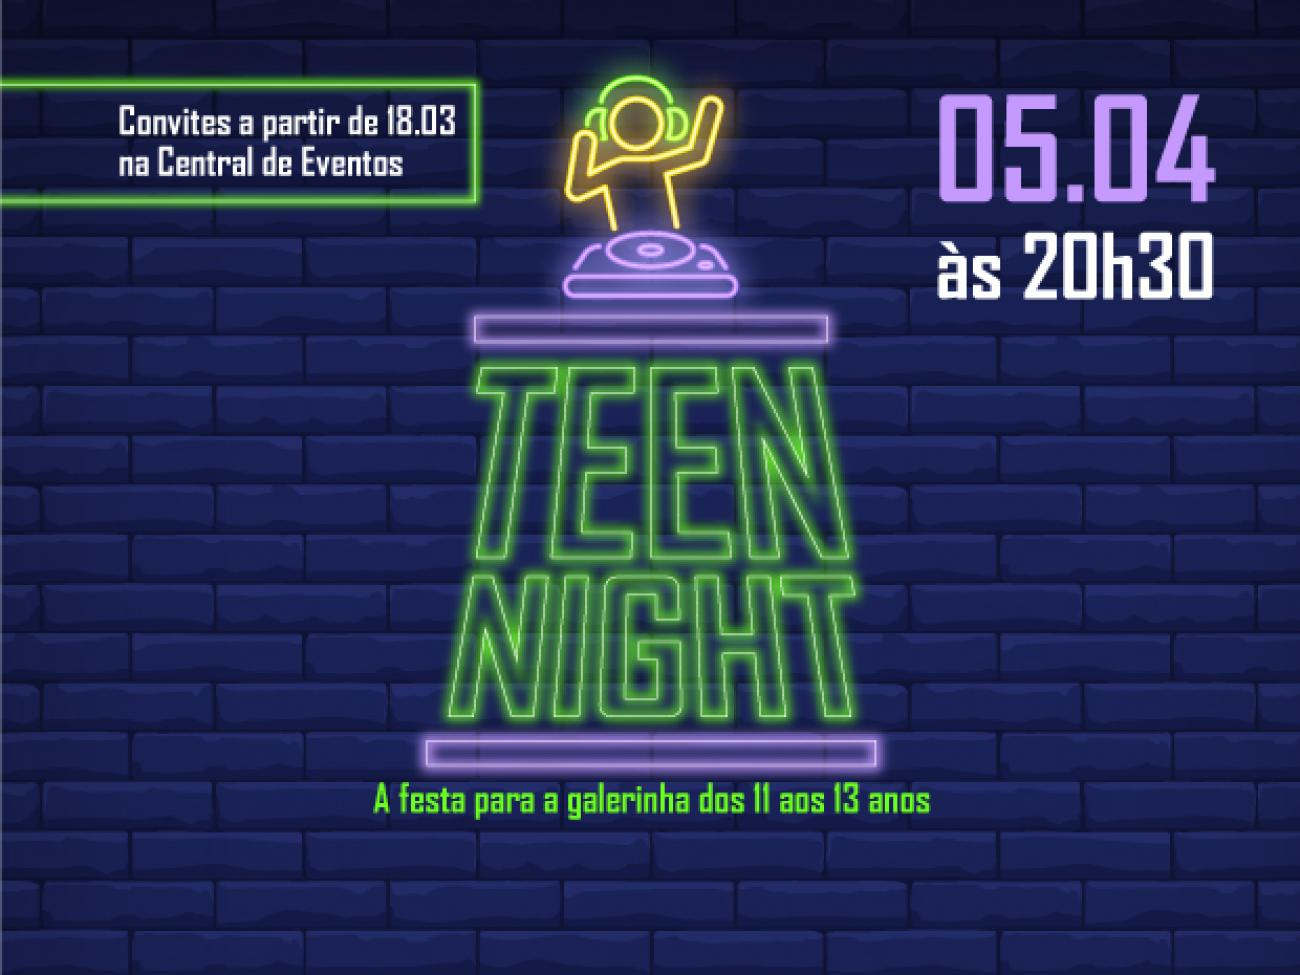 Teen Night: prepare-se para a festa!